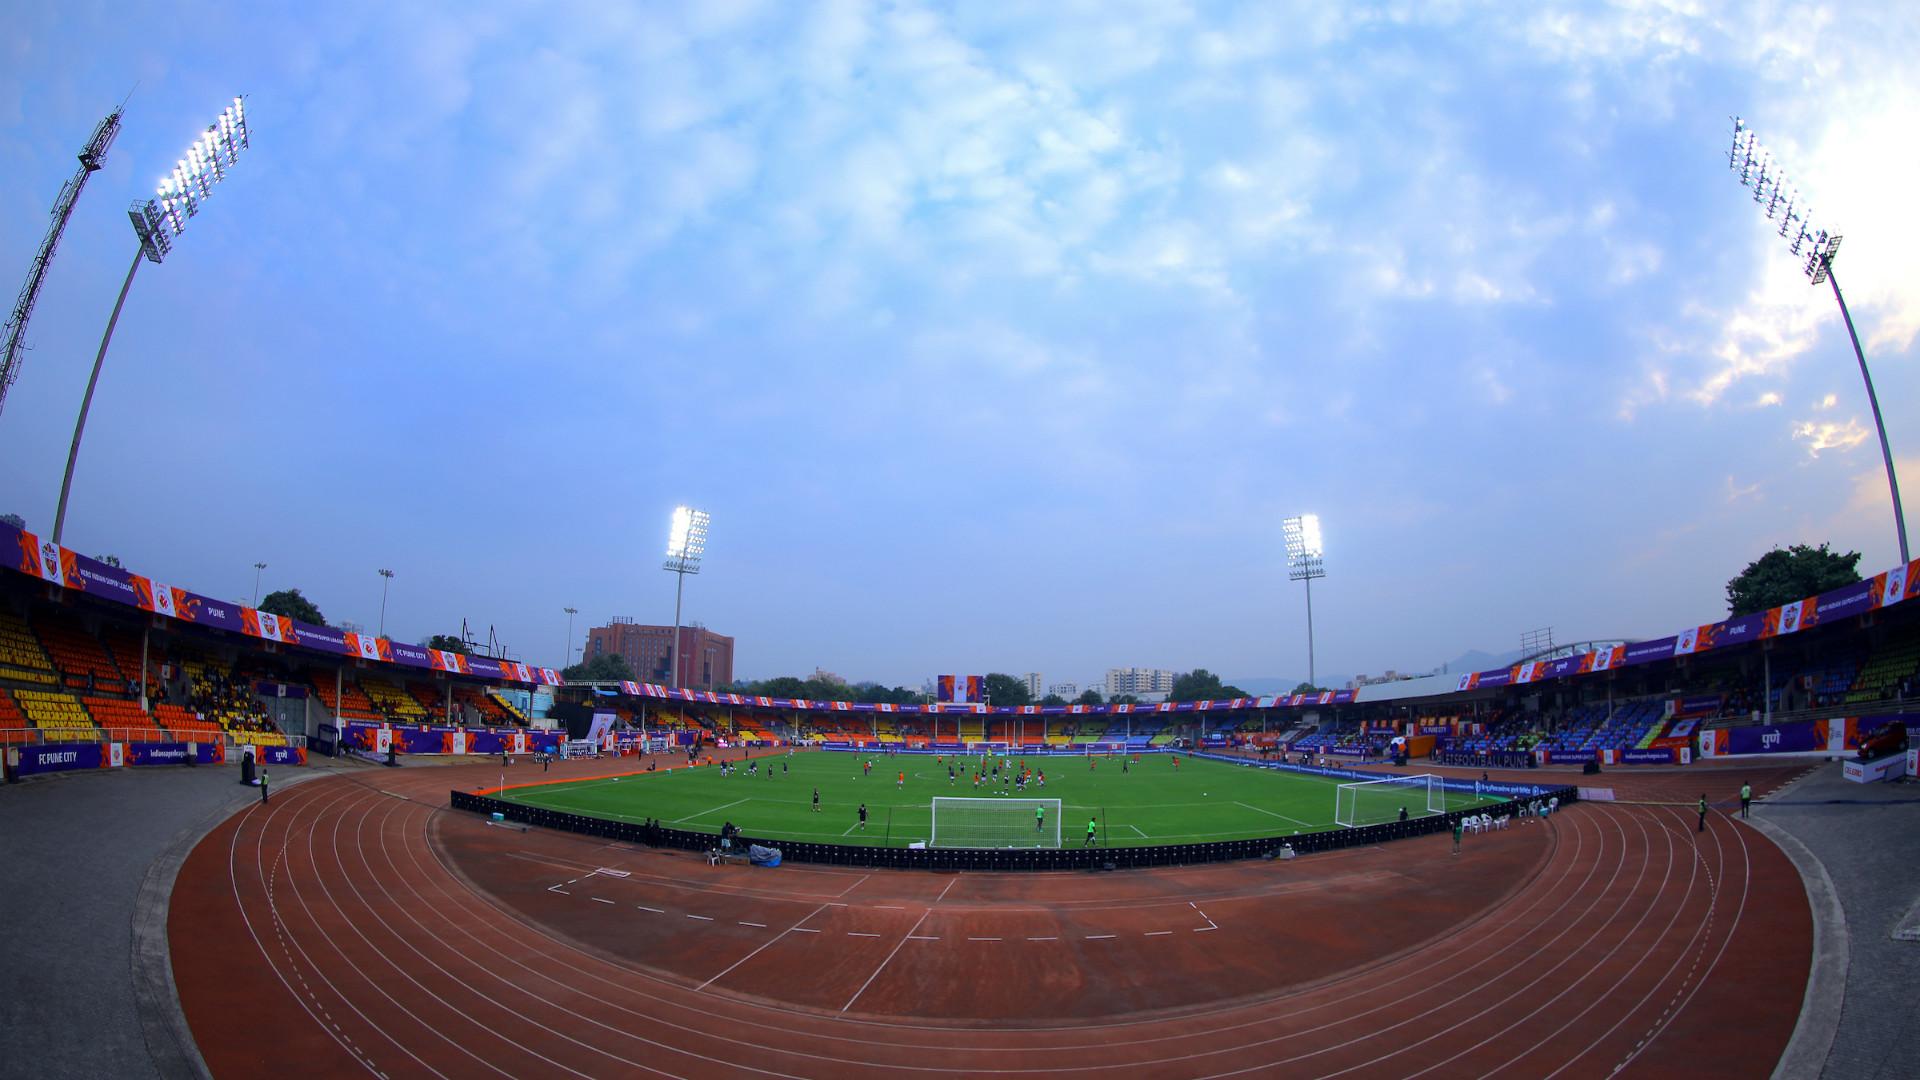 Shree Shiv Chhatrapati Sports Complex Balewadi